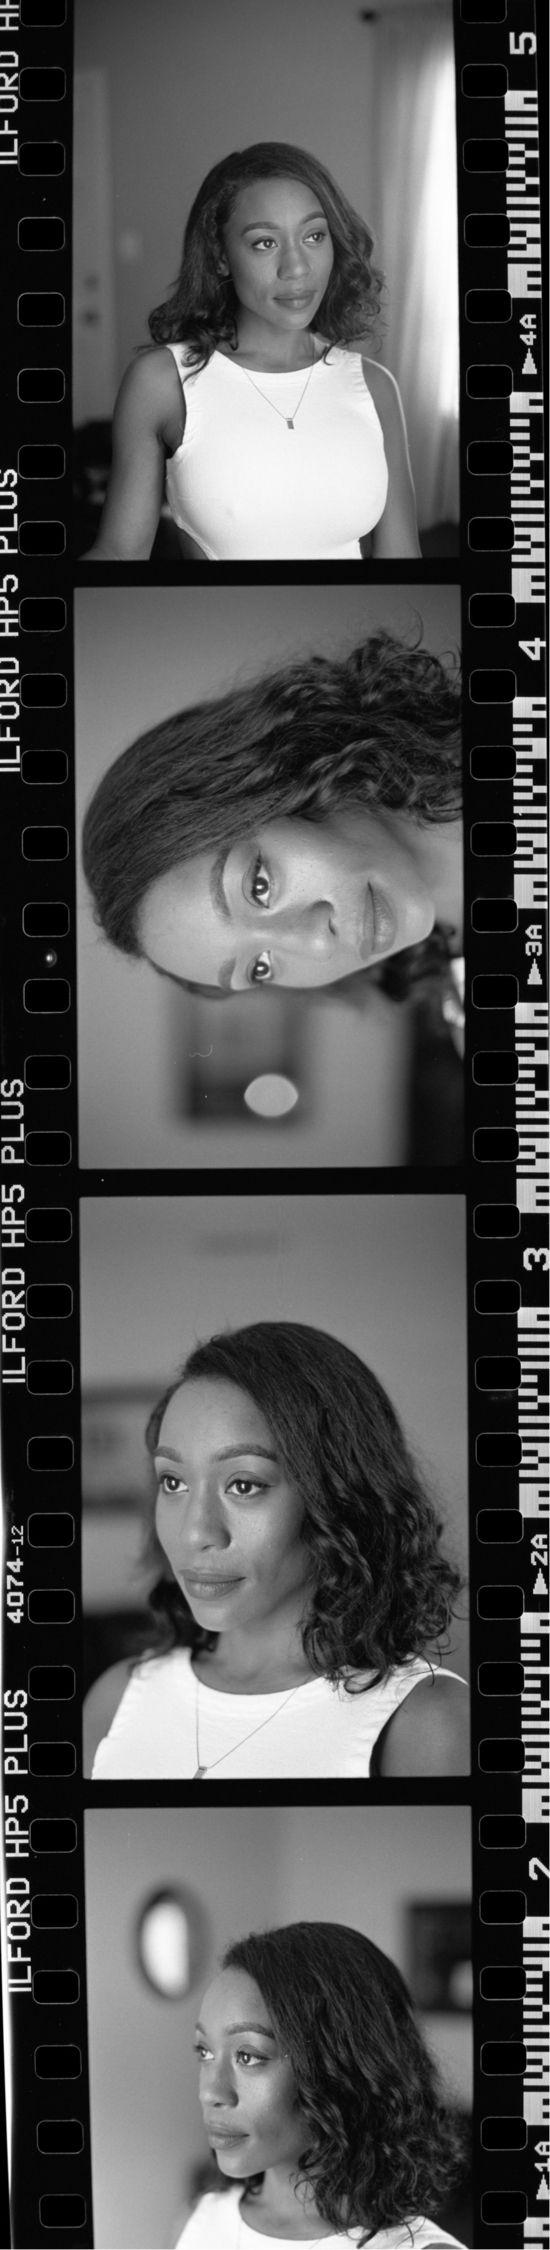 roll Ilford HP5 film shot Ashle - hullisbeautiful   ello